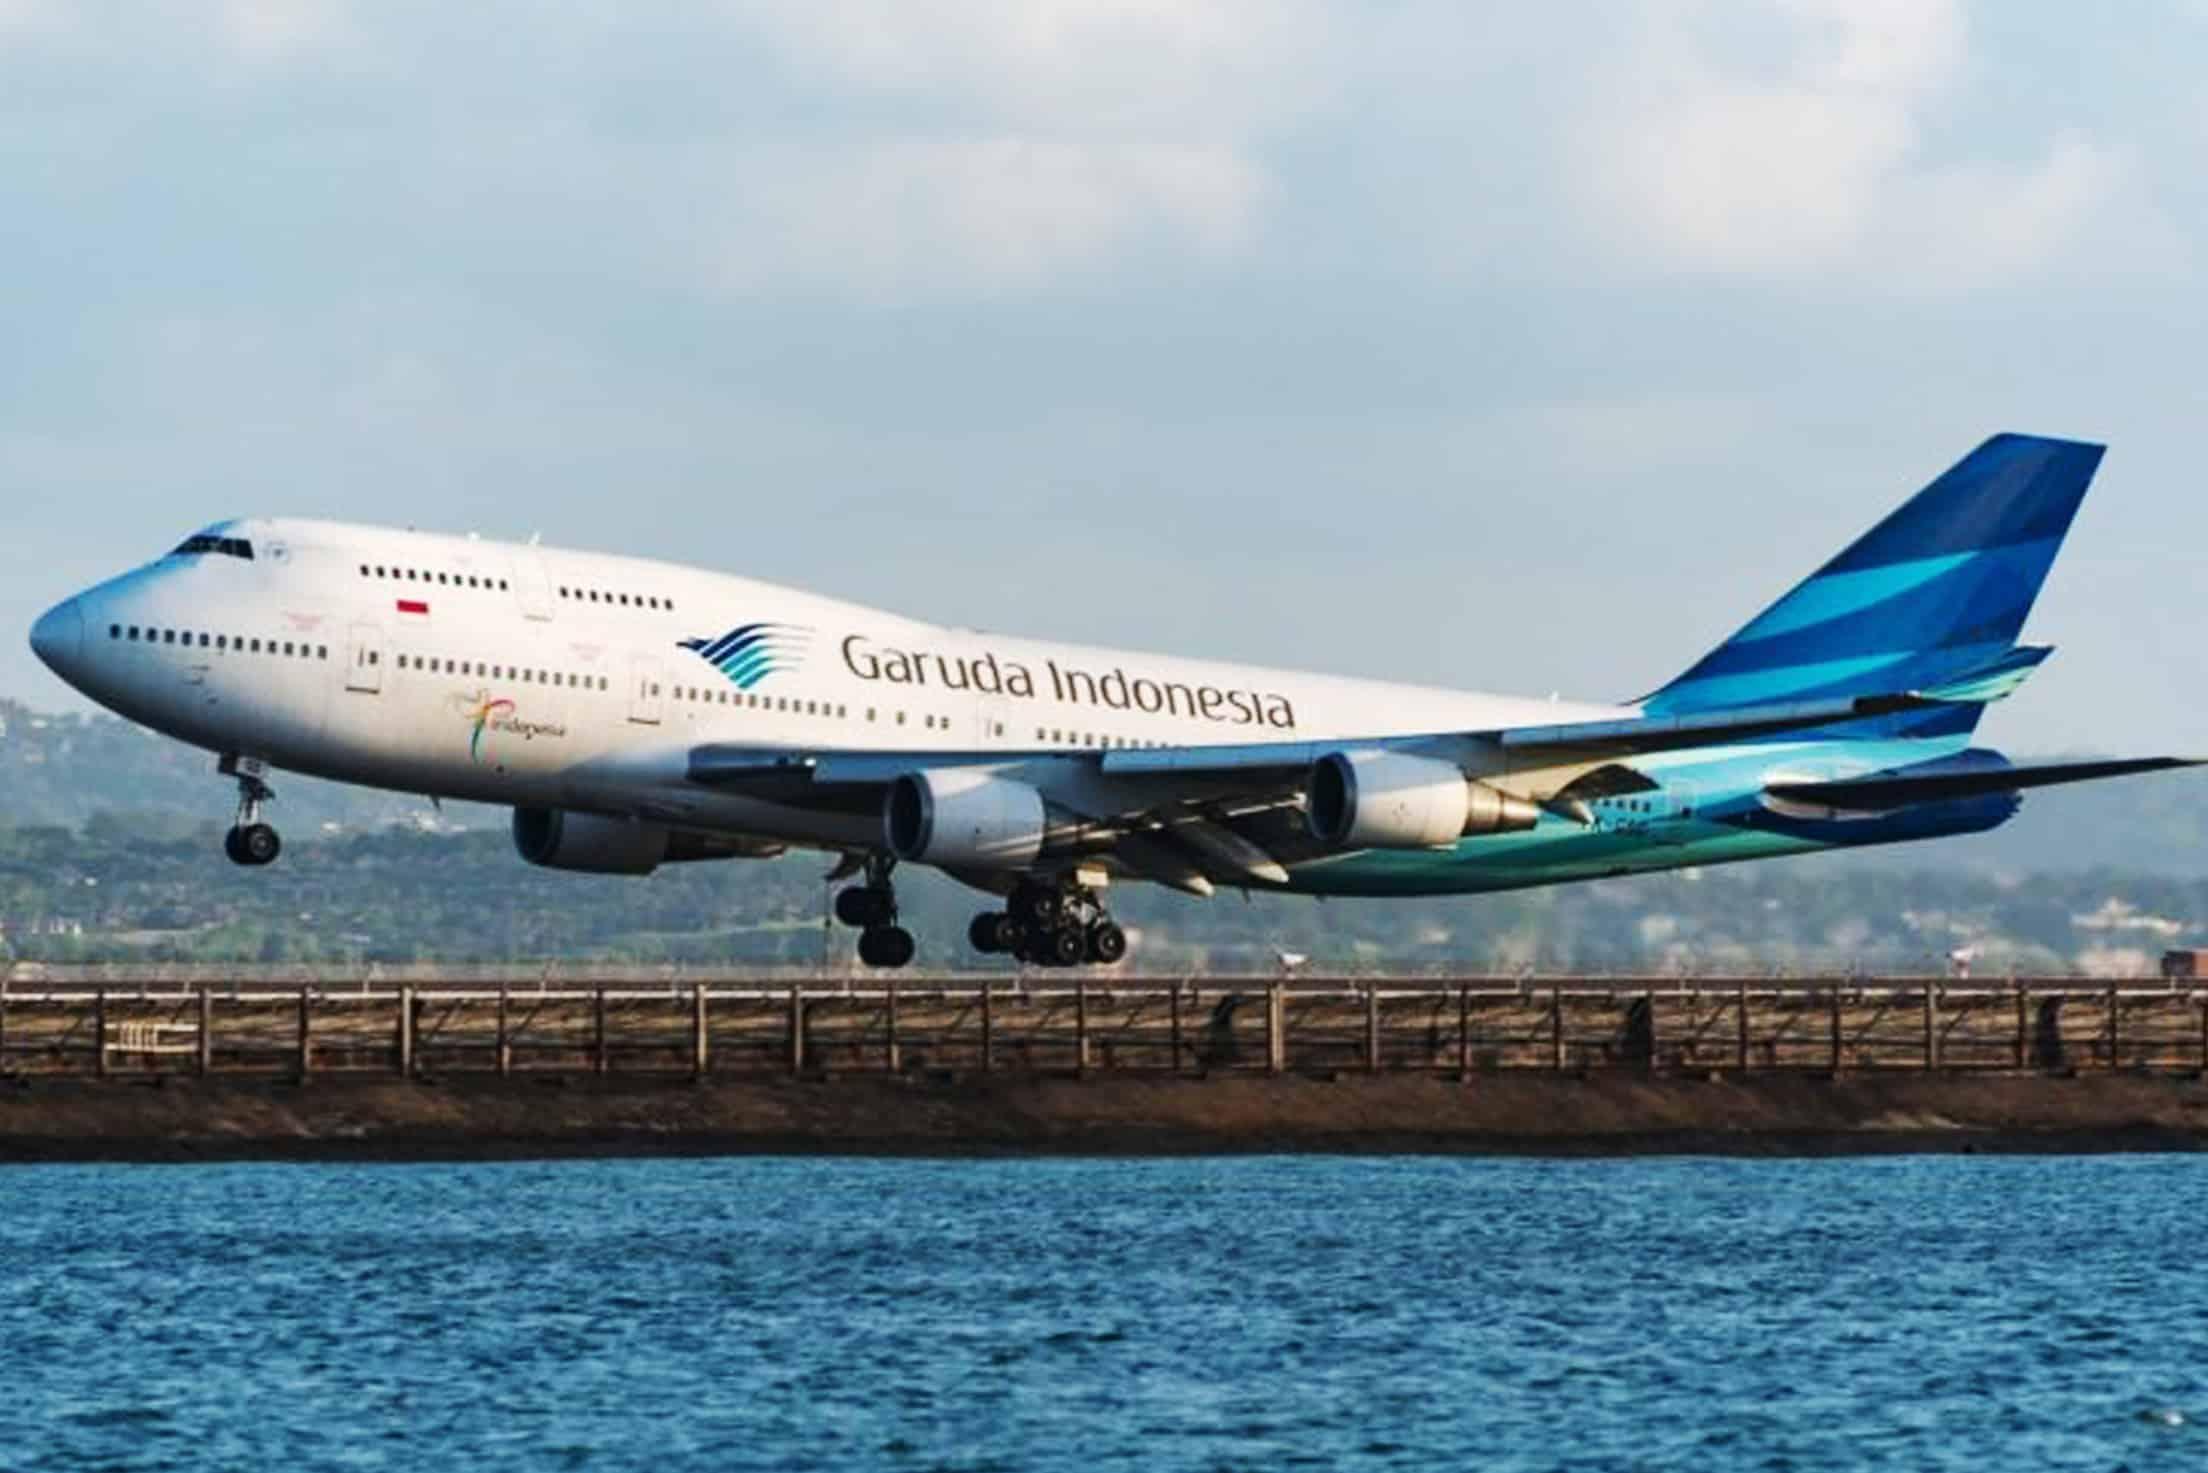 BALI IN FULL TRAVEL LOCKDOWN AS FLIGHTS BANNED UNTIL JUNE